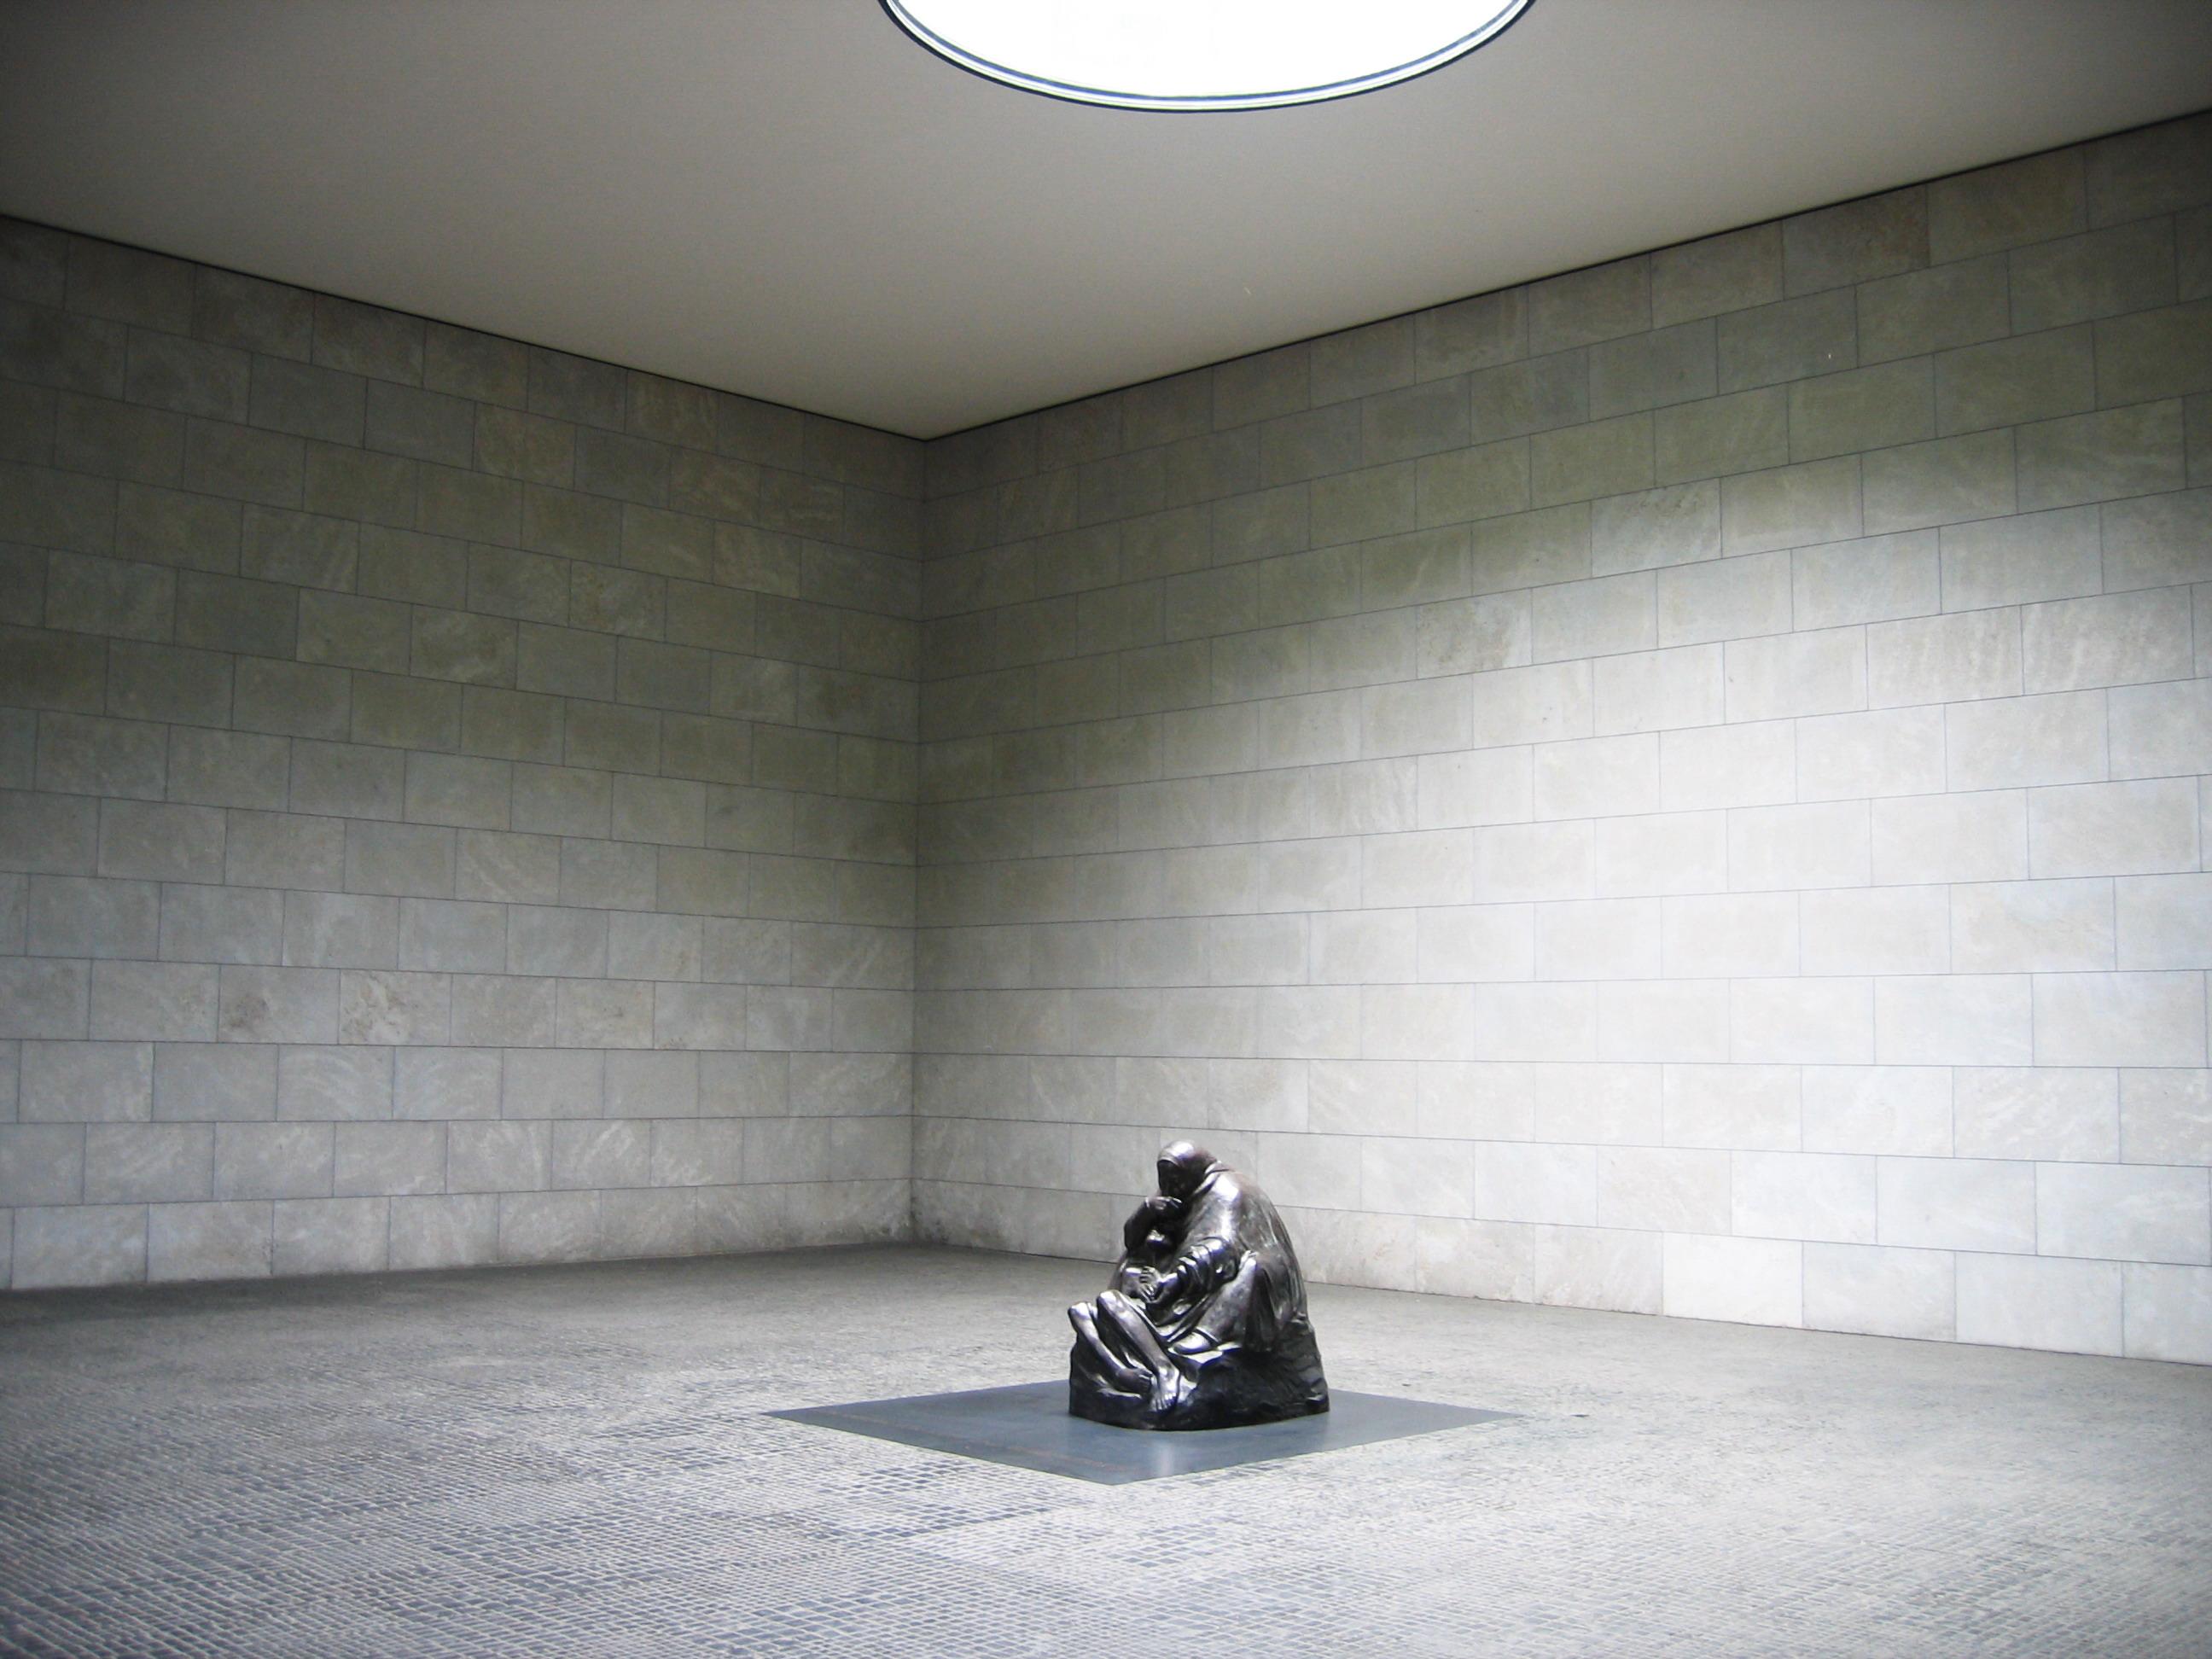 Berlin,_Neue_Wache,_interior_view,_2005